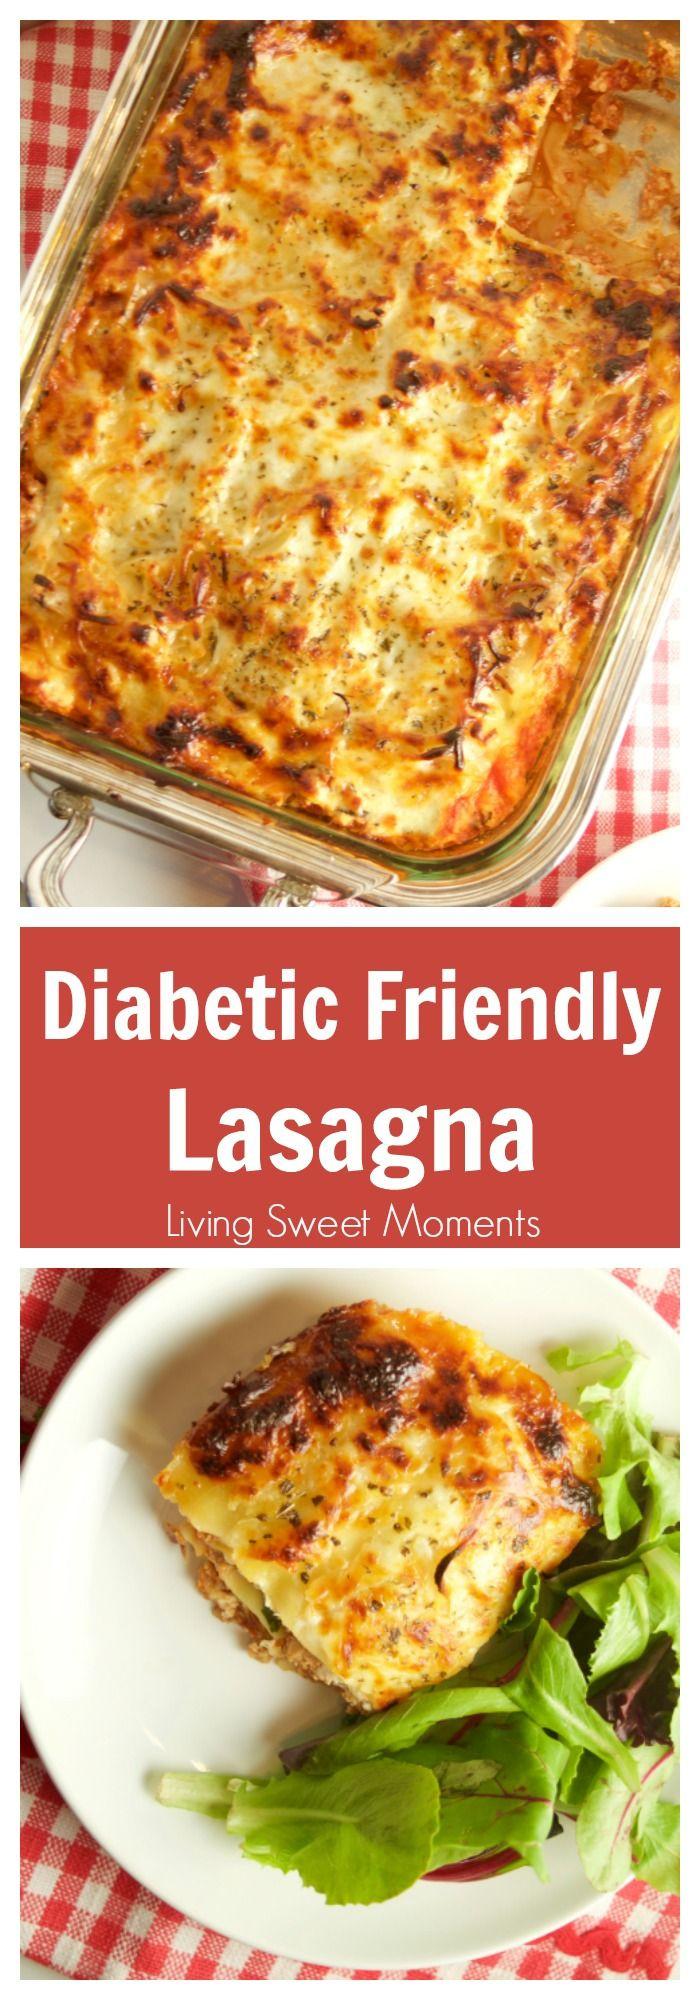 Diabetic Gourmet Recipes  100 Diabetic Dinner Recipes on Pinterest